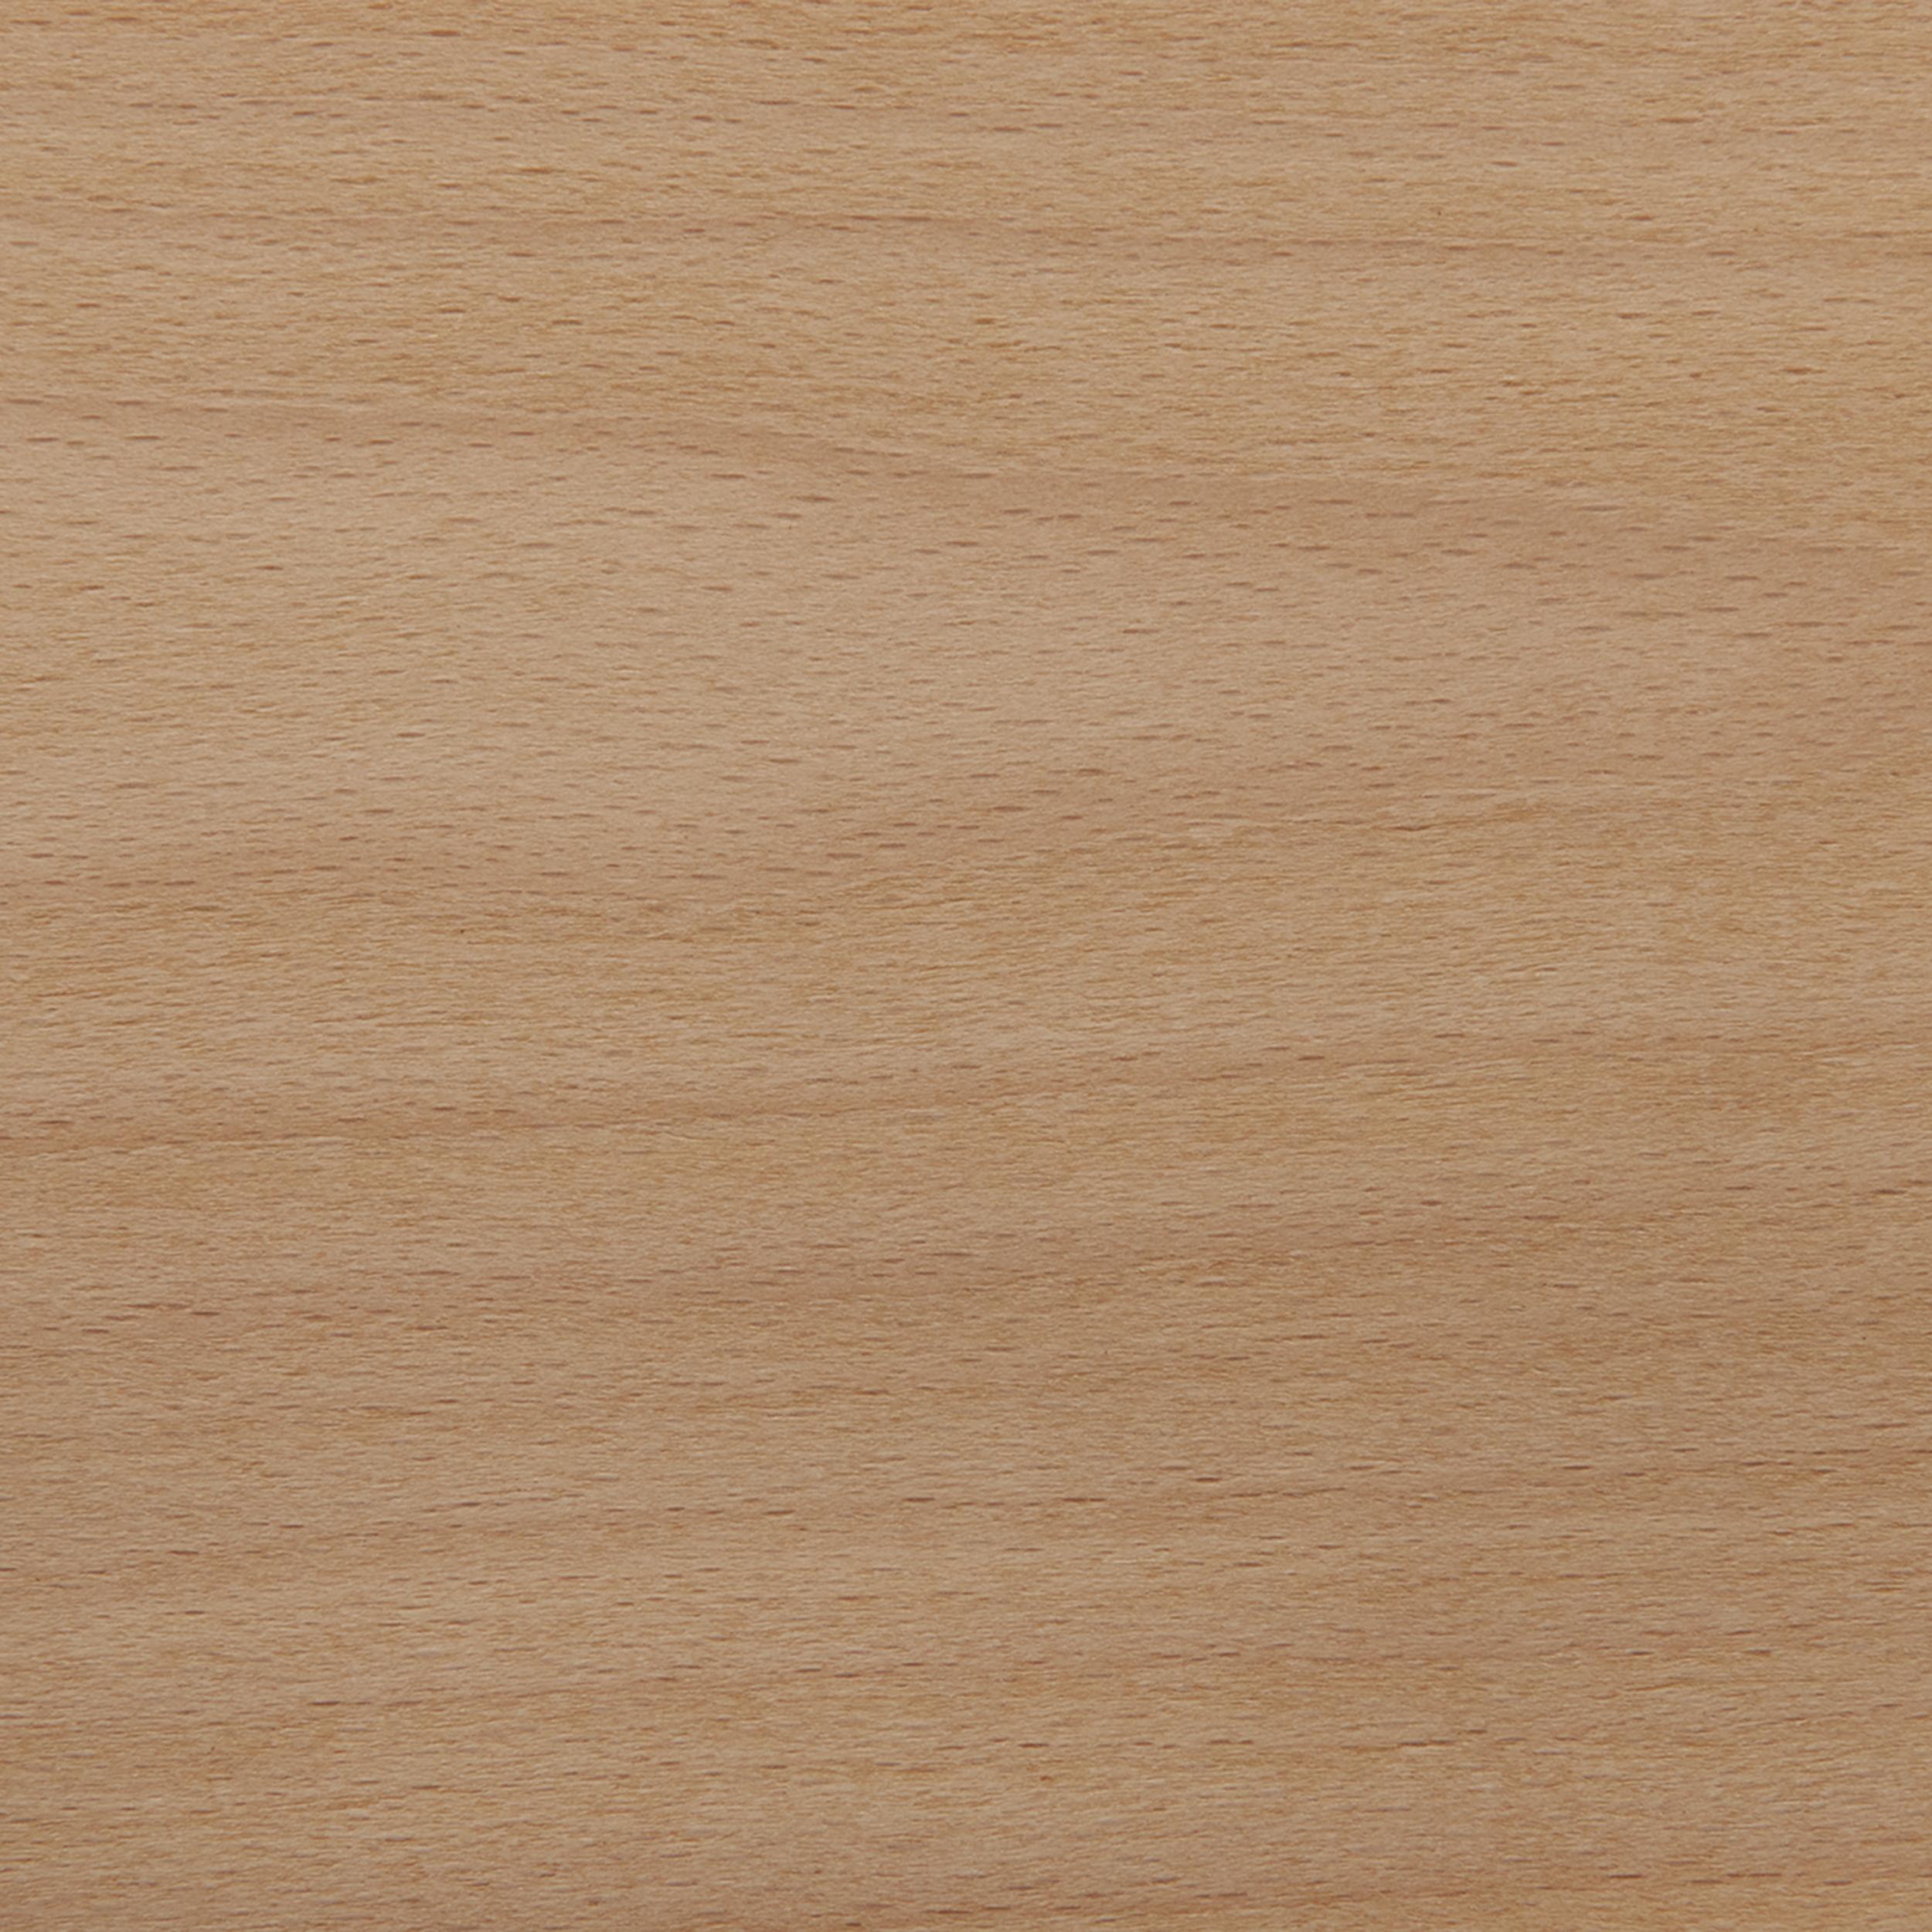 Beech, Flat Cut 4'x8' Veneer Sheet, 3M PSA Backed